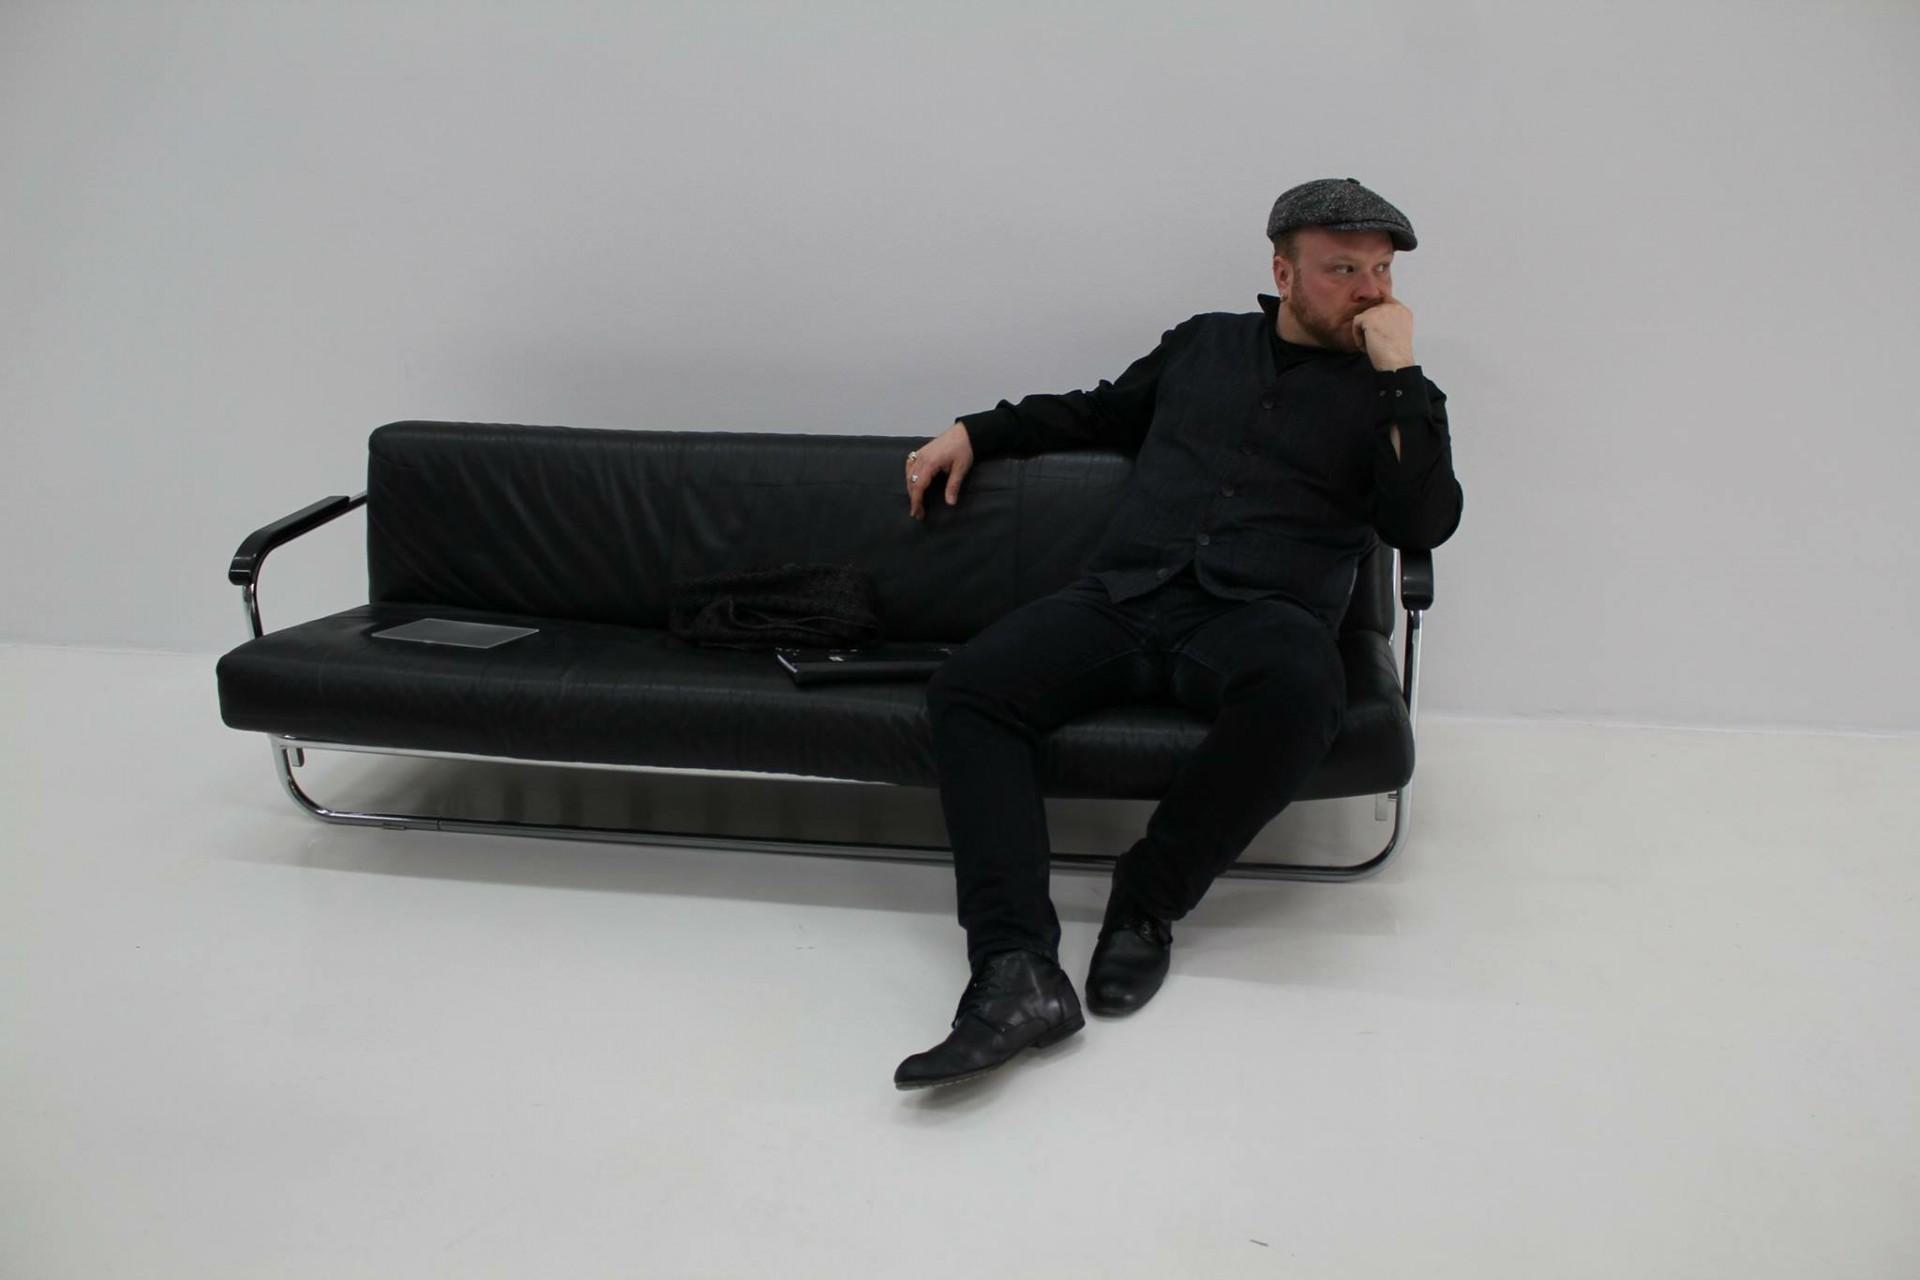 tiborbaumann werbung/musik/doku